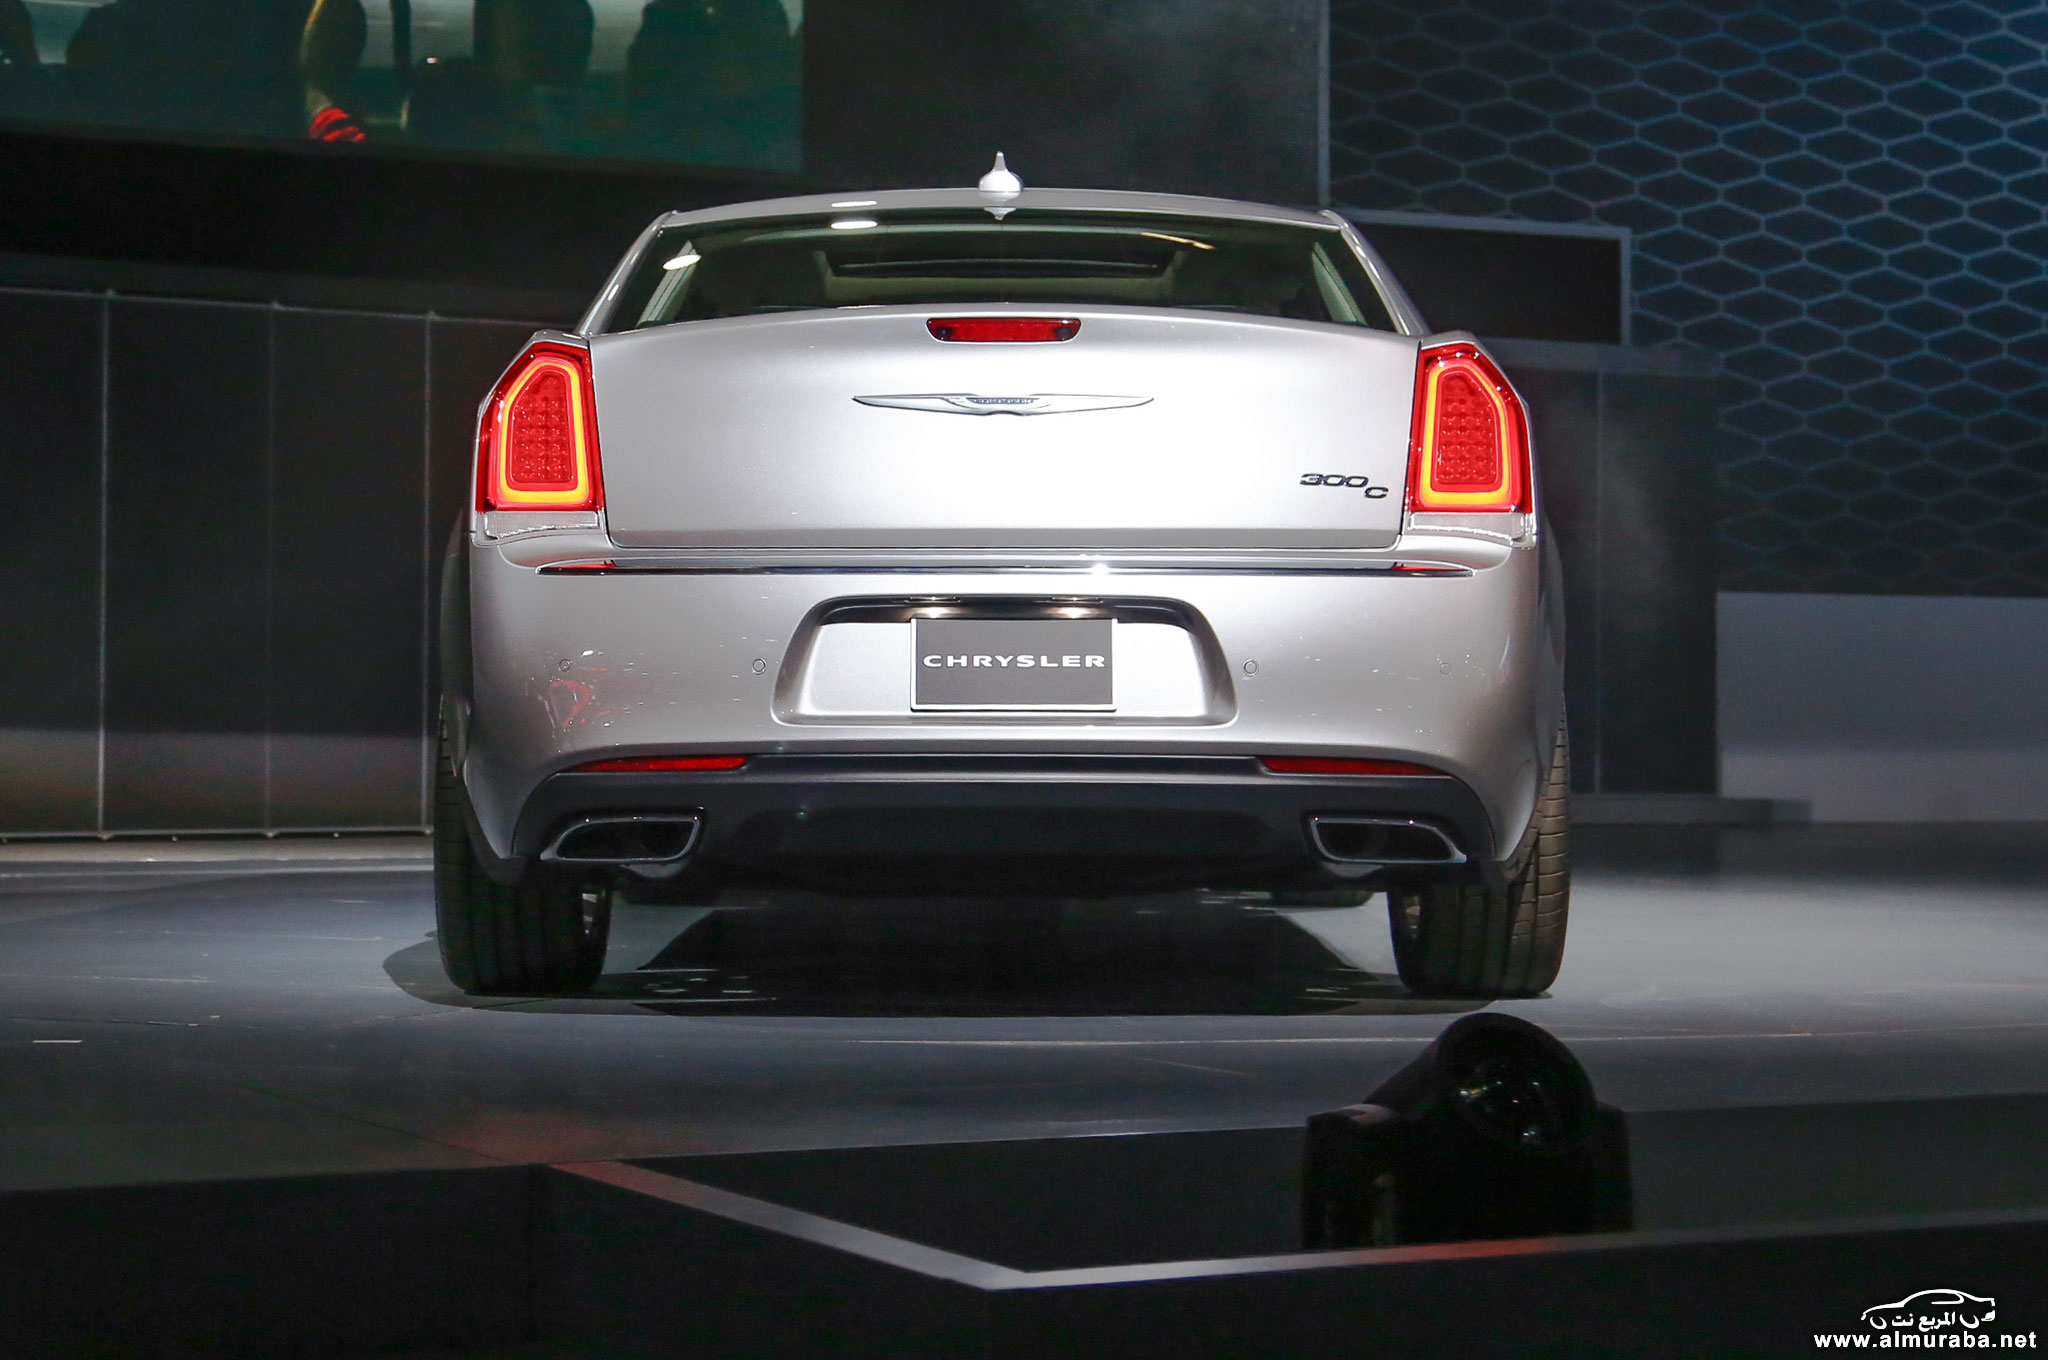 2015-chrysler-300c-rear-view